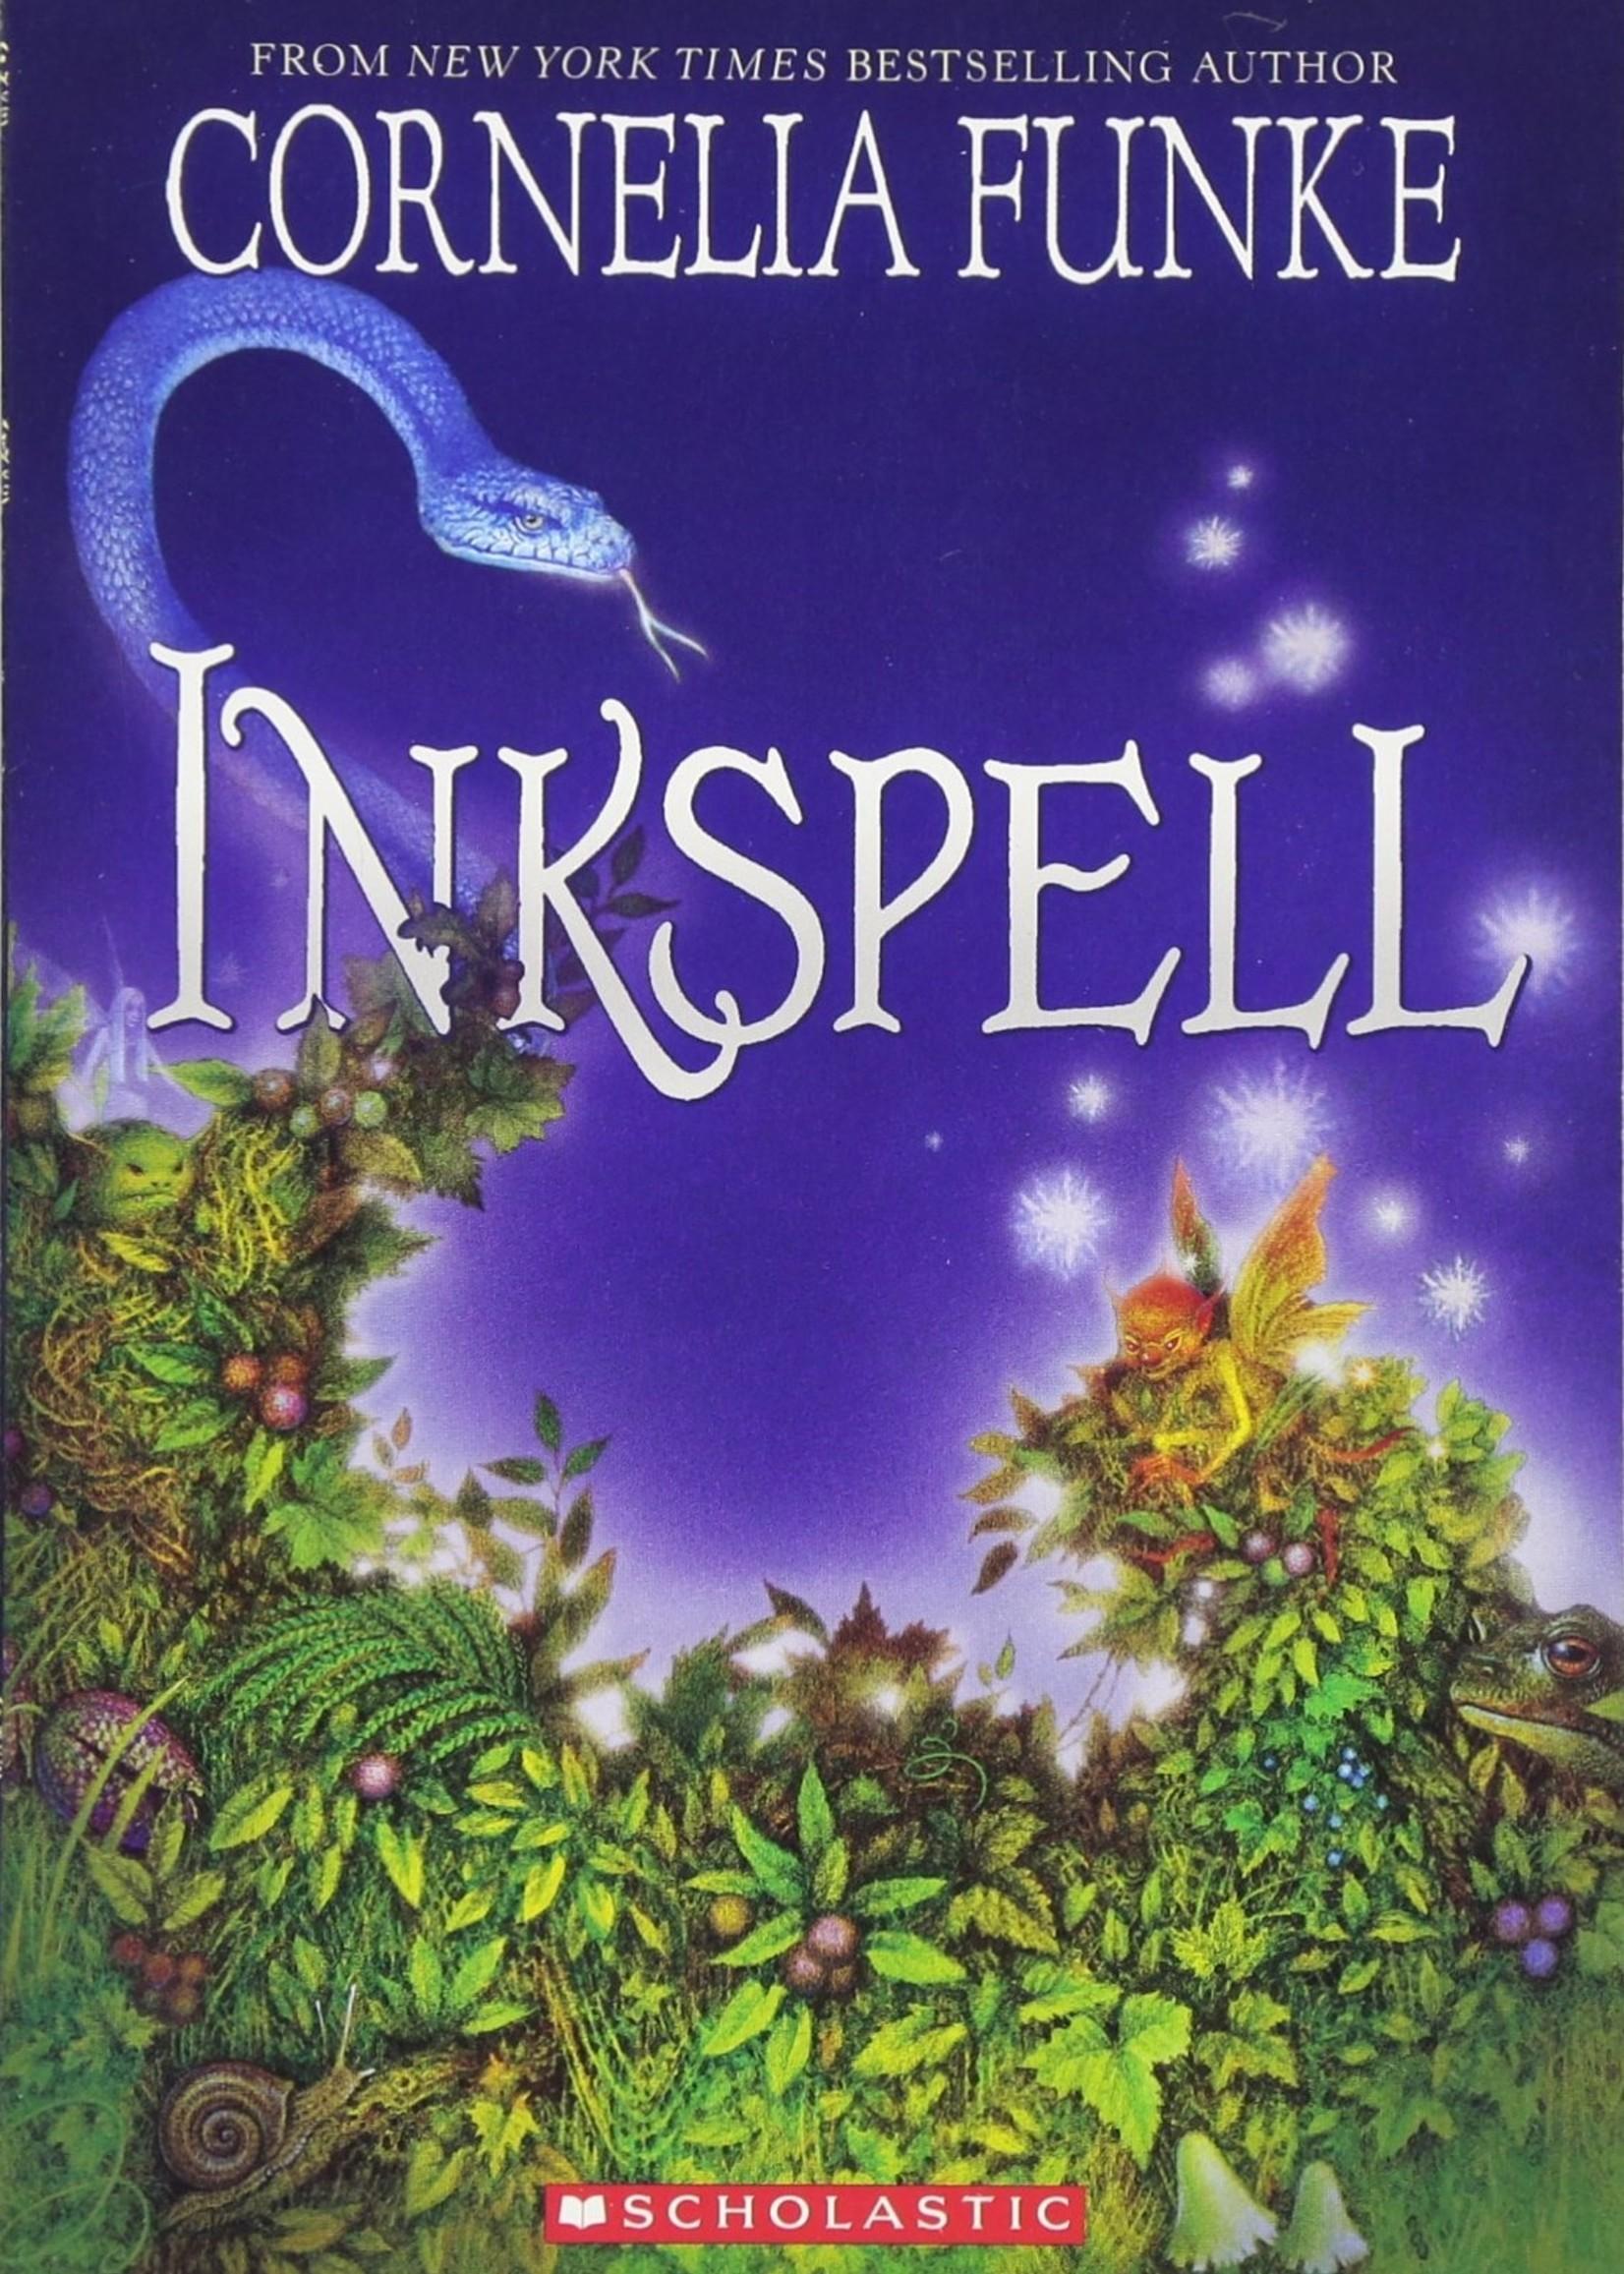 Inkheart Trilogy #02, Inkspell - Paperback